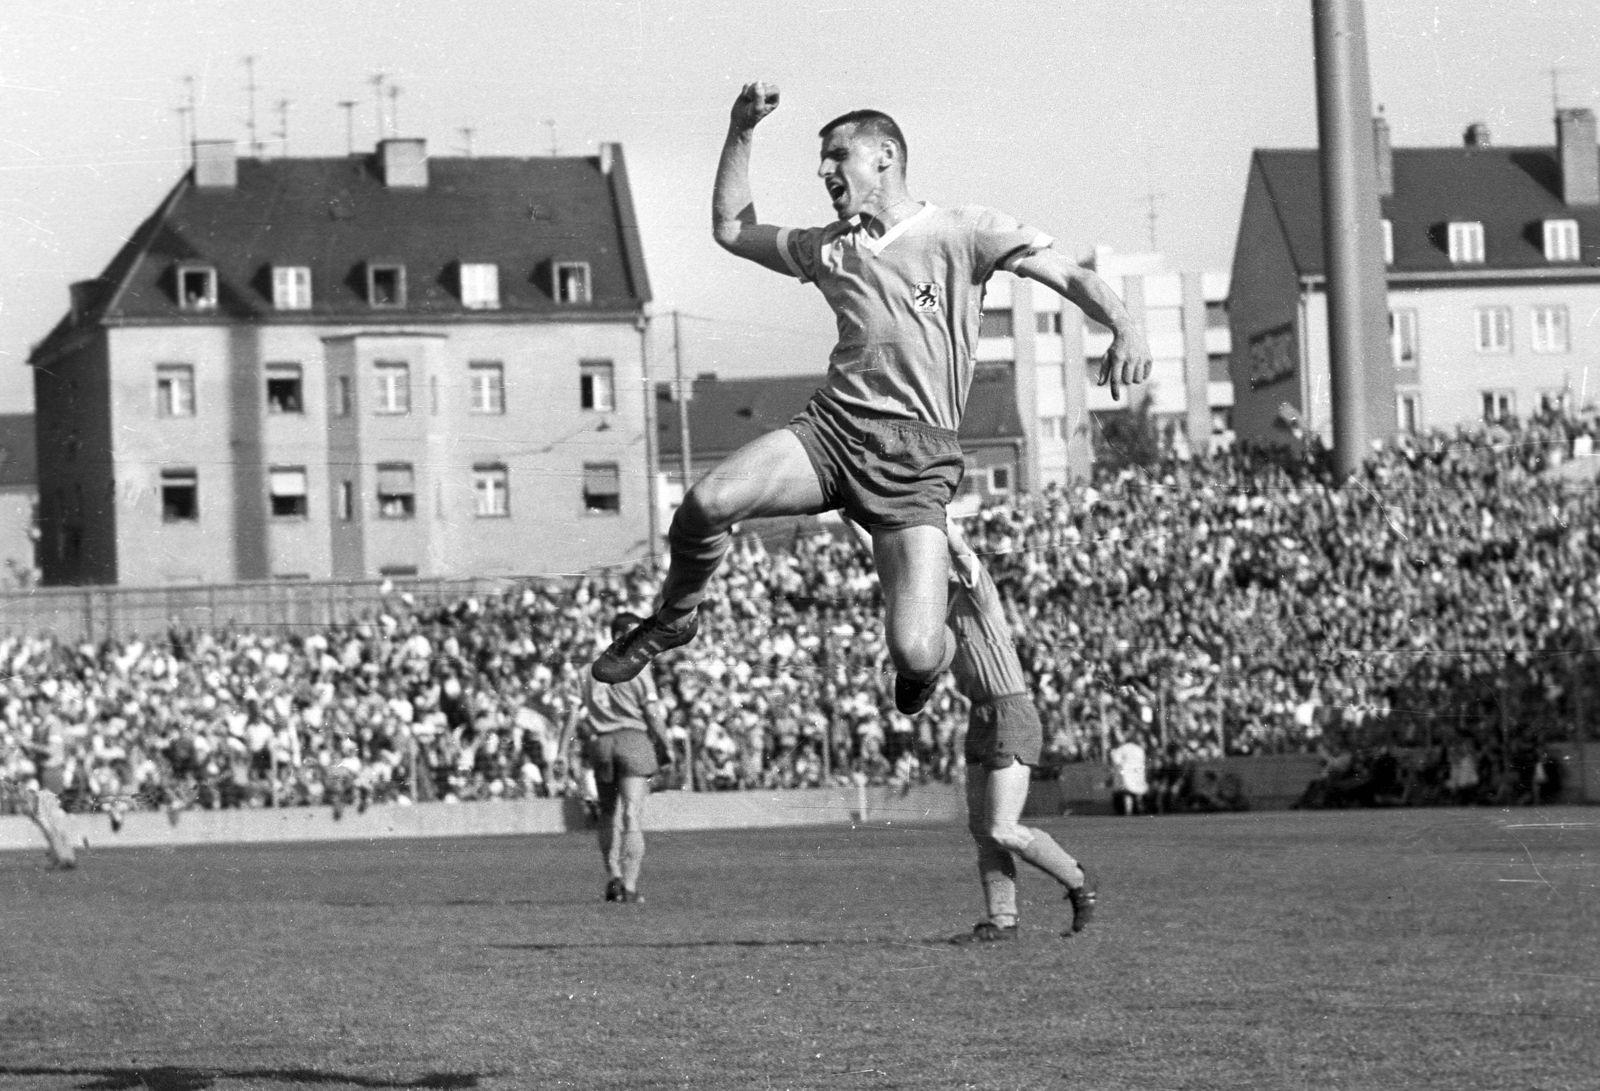 TSV München 1860 Borussia Moenchengladbach am 14 05 1966 3 3 Jubel von Timo Konietzka 1860 im